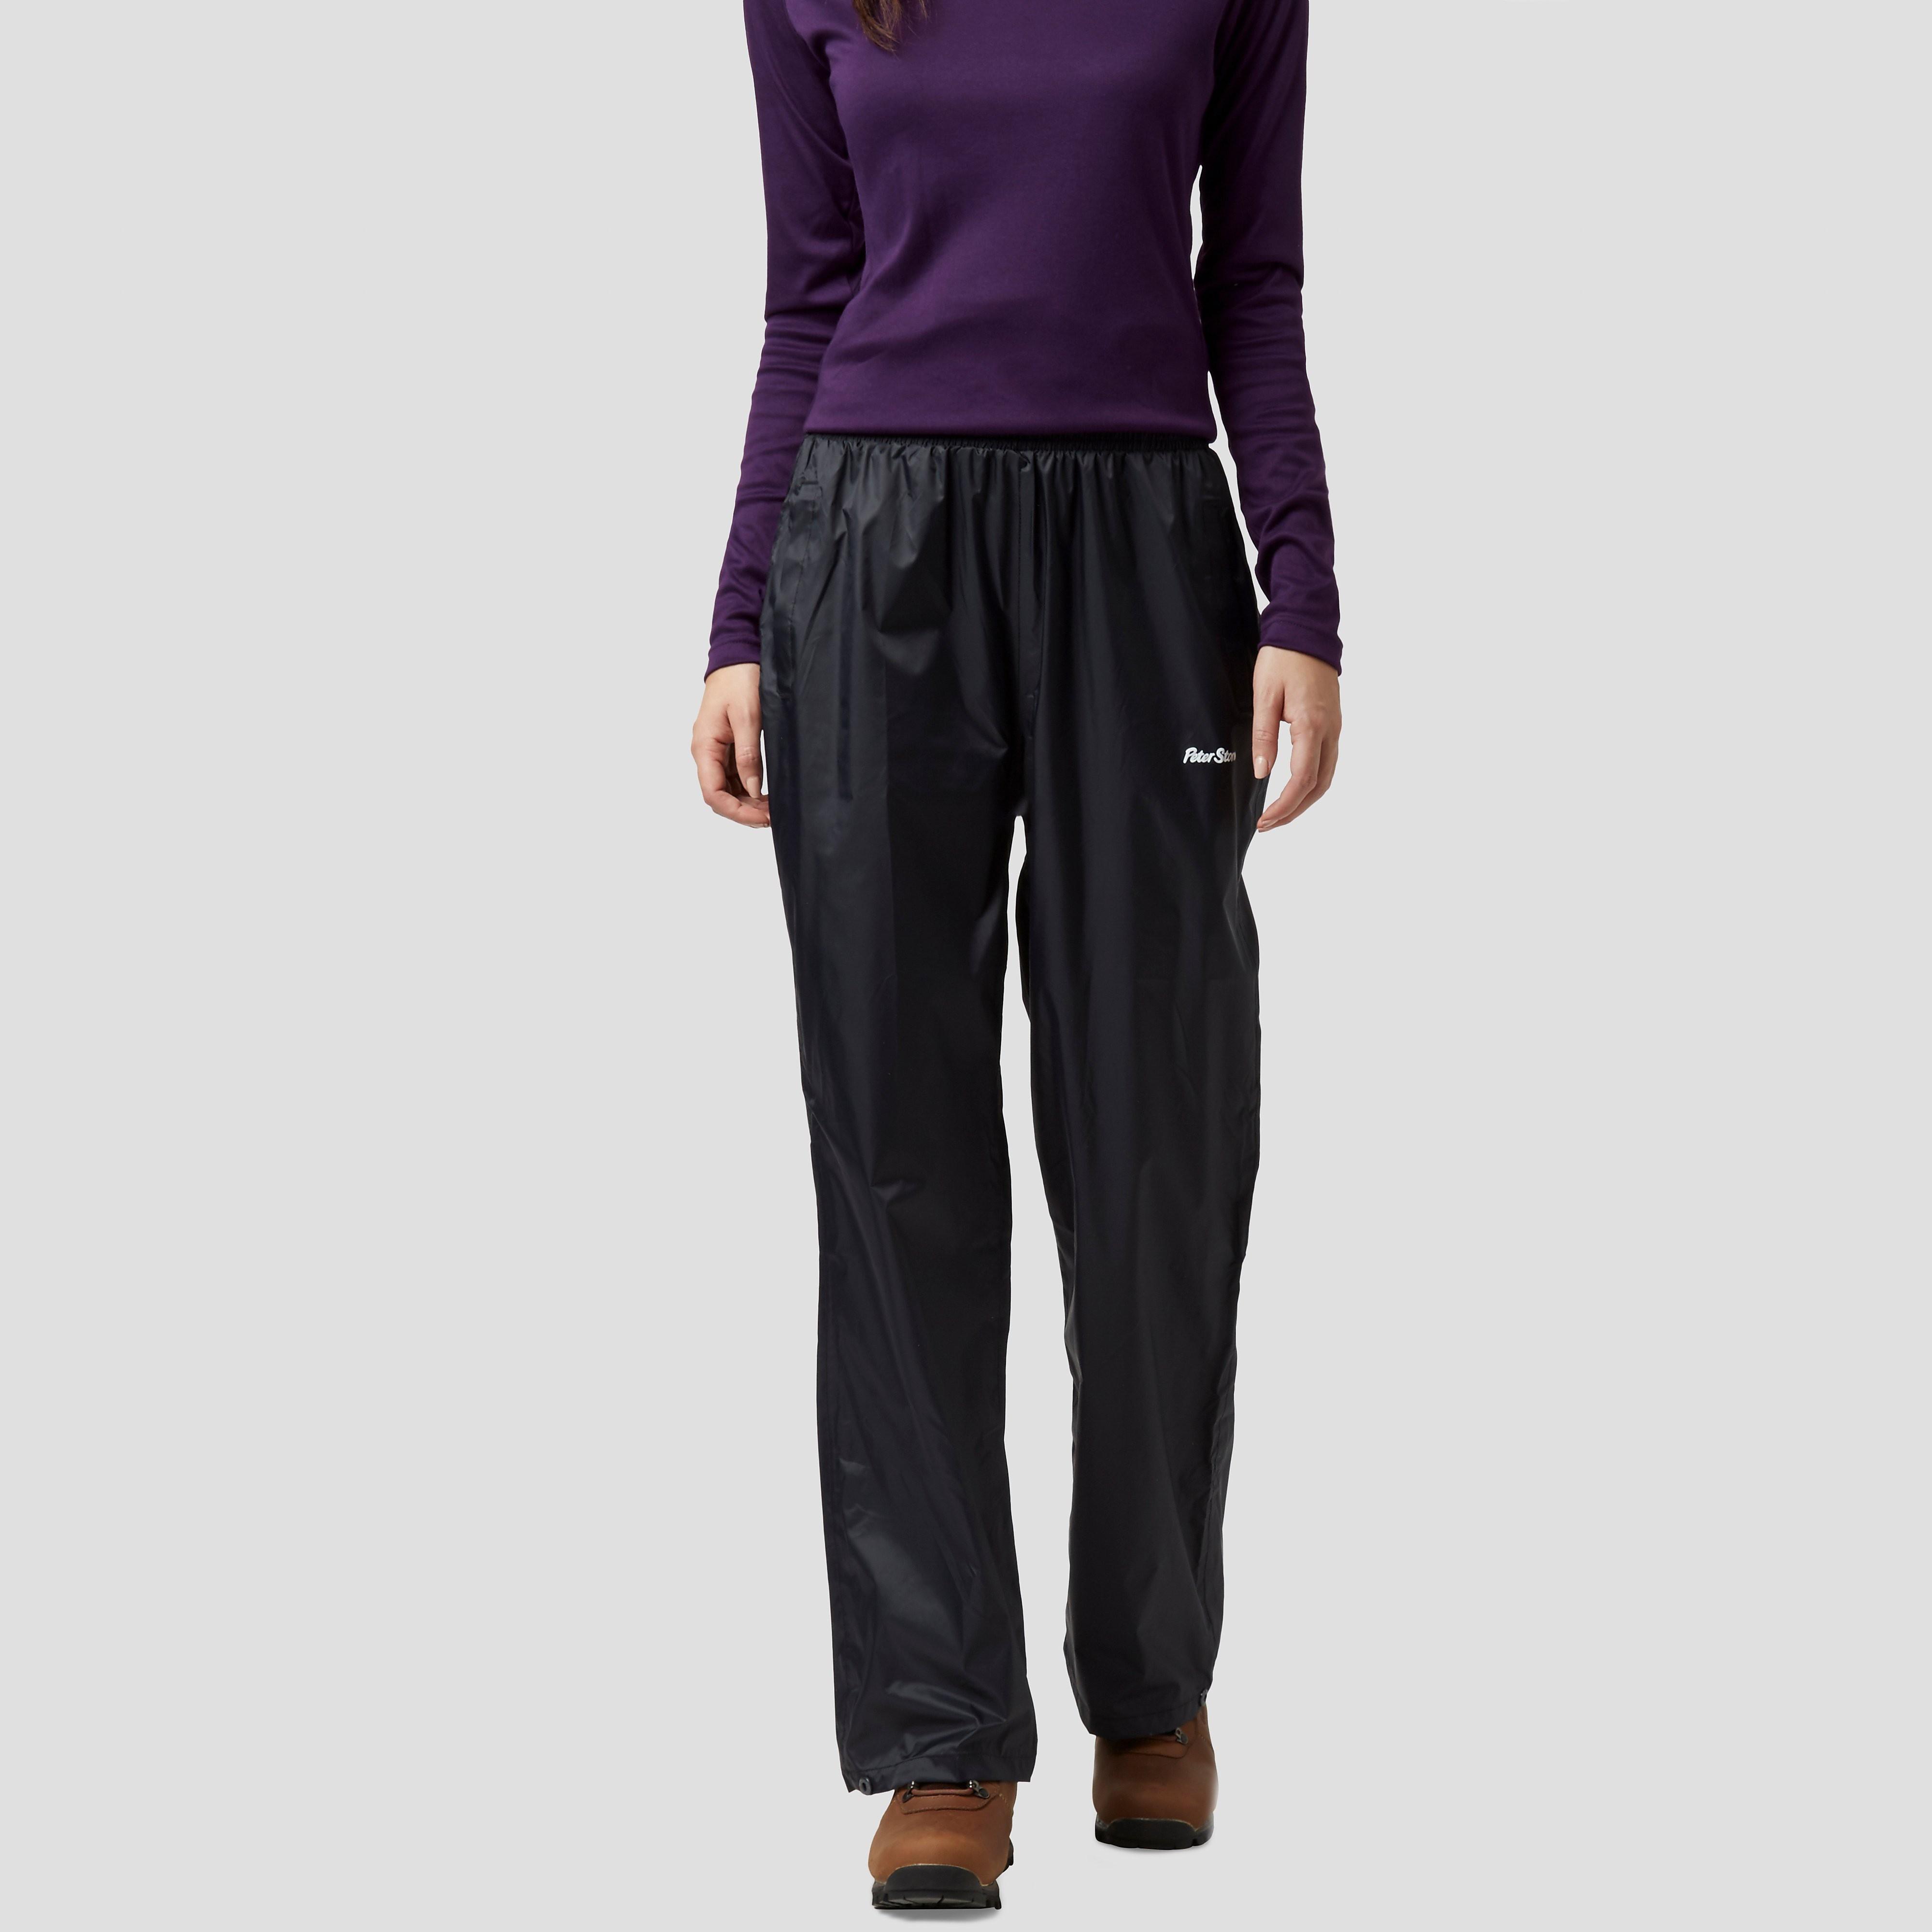 Peter Storm Packable Women's Pants